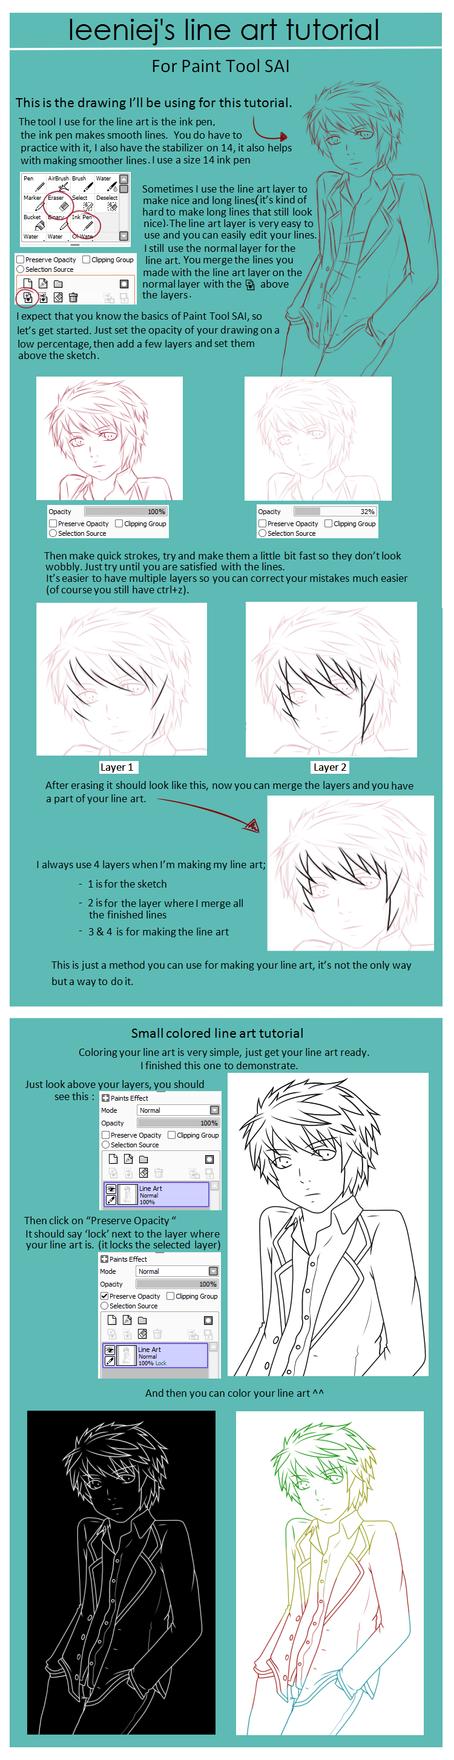 Single Weight Line Art Tutorial : Line art tutorial by leeniej on deviantart